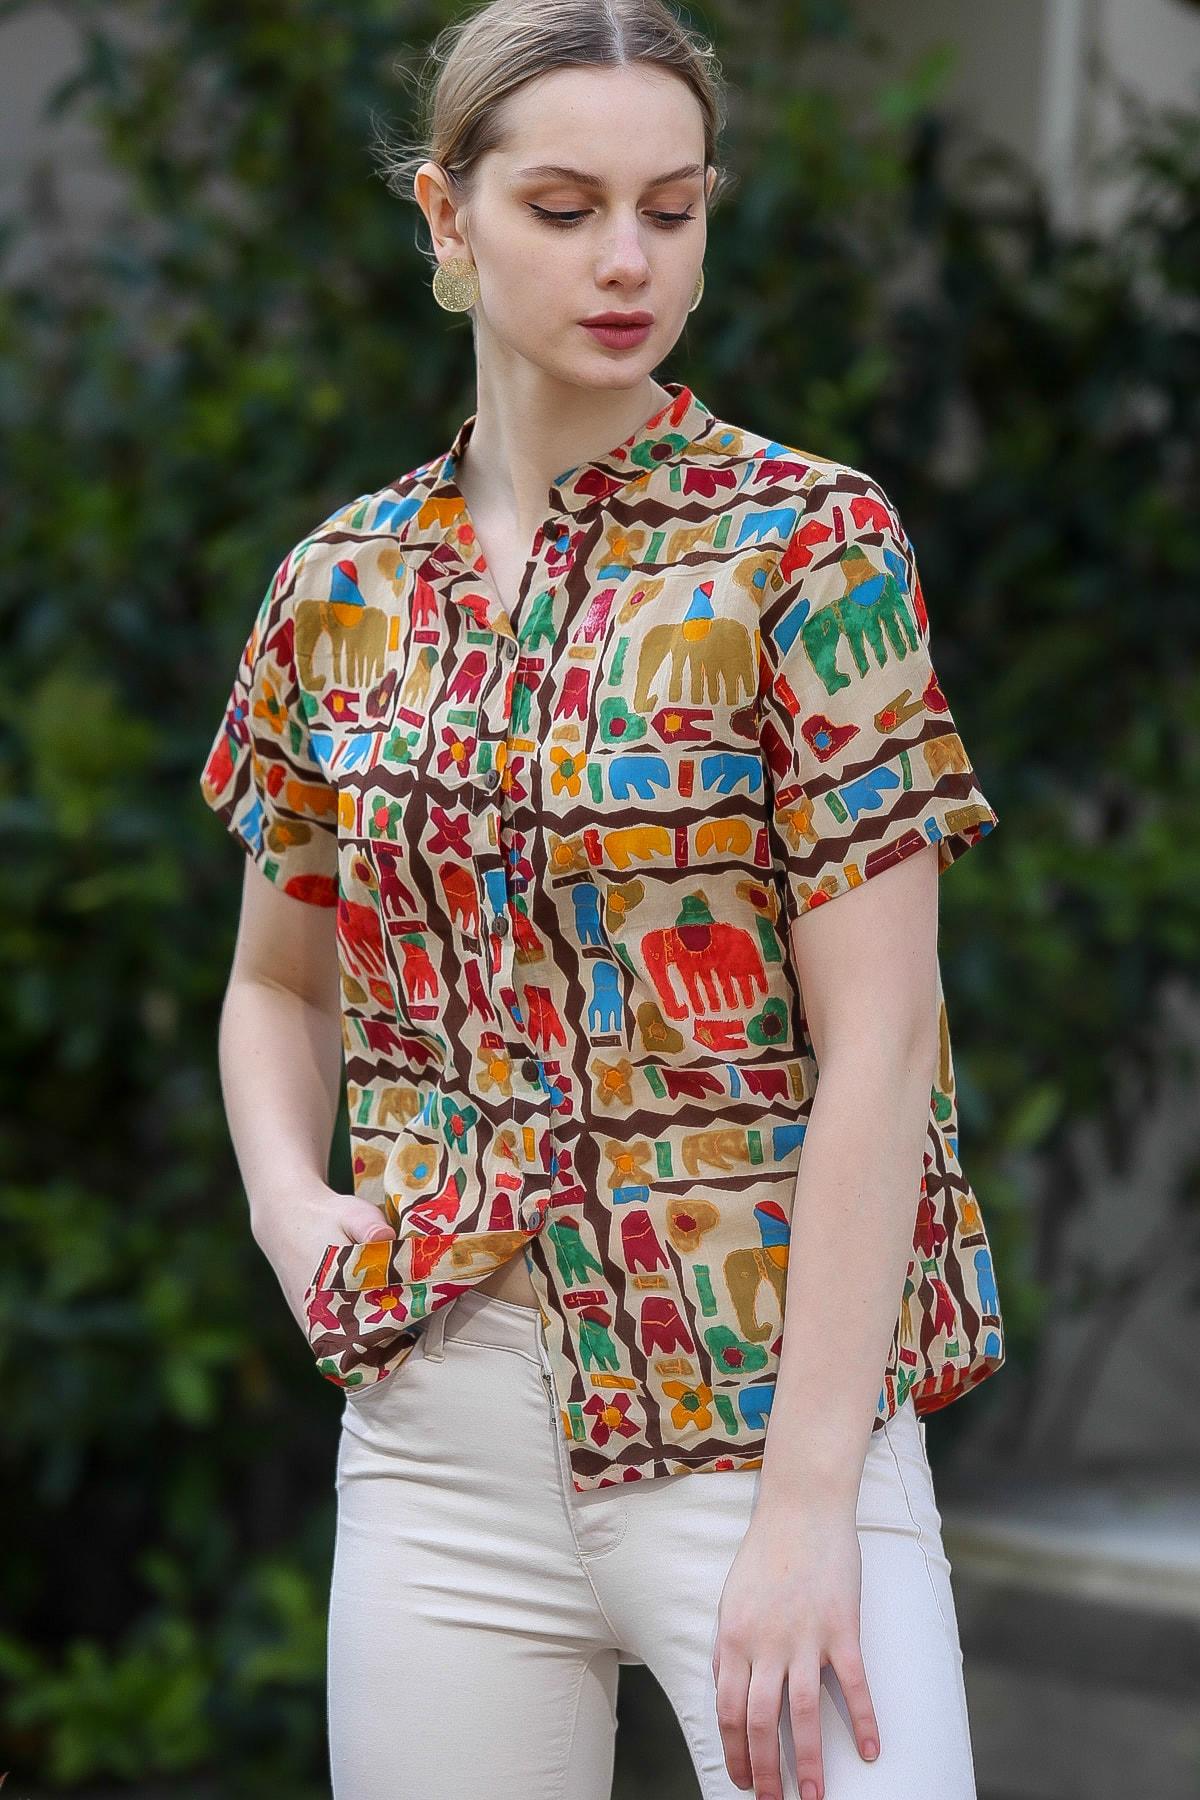 Chiccy Kadın Bej Yakasız Düğme Detaylı Fil Desenli Dokuma Bluz M10010200BL95376 0